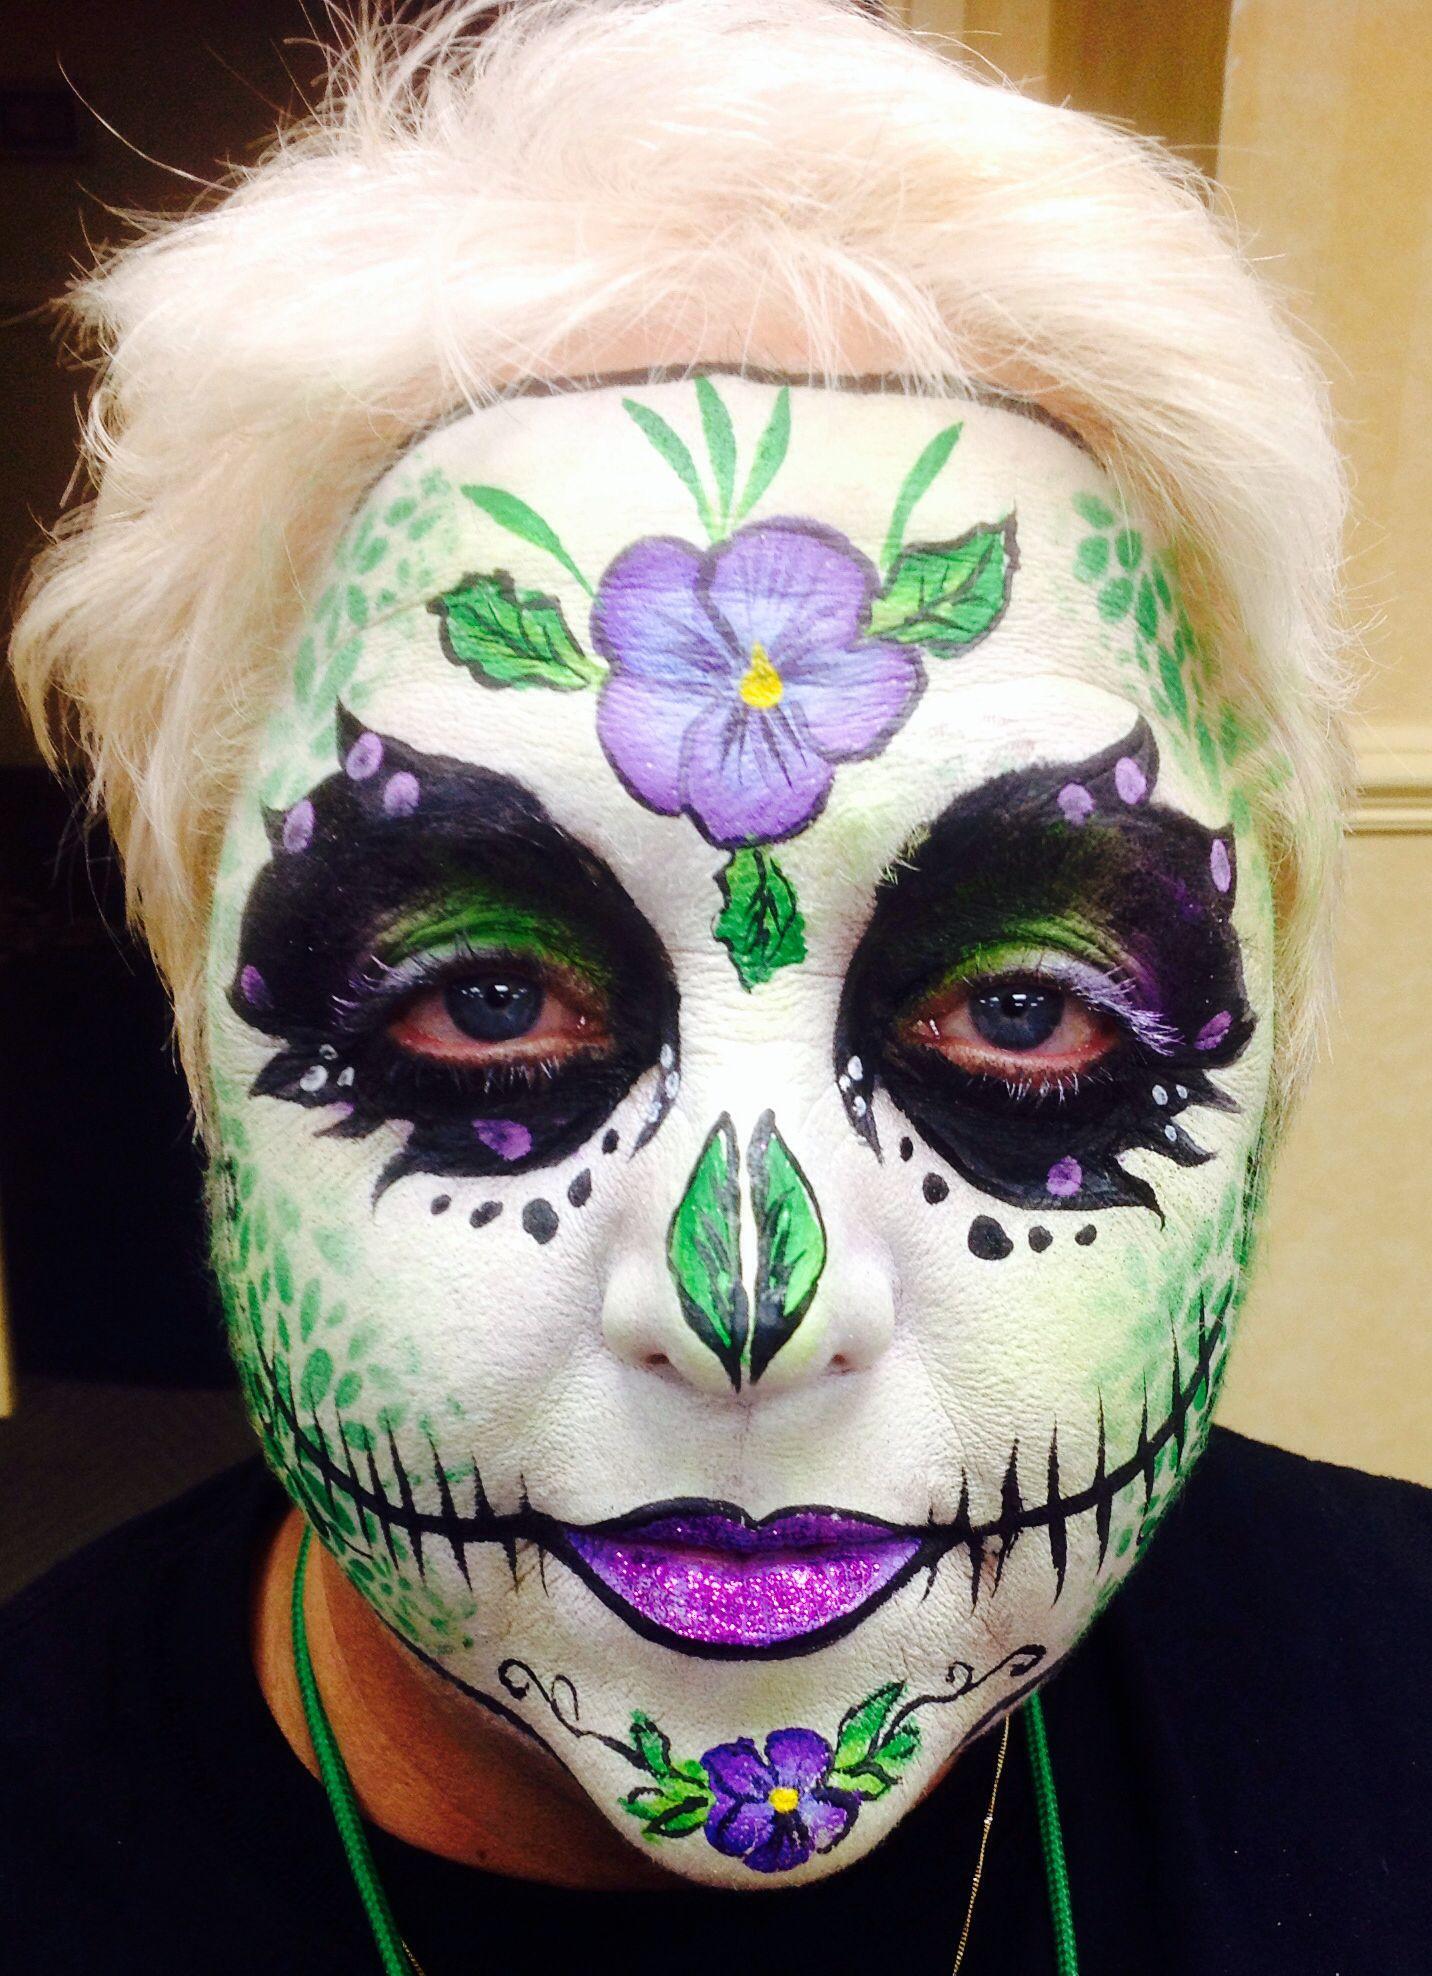 Pansy sugar skull by Cheryl Painter, nj Halloween face